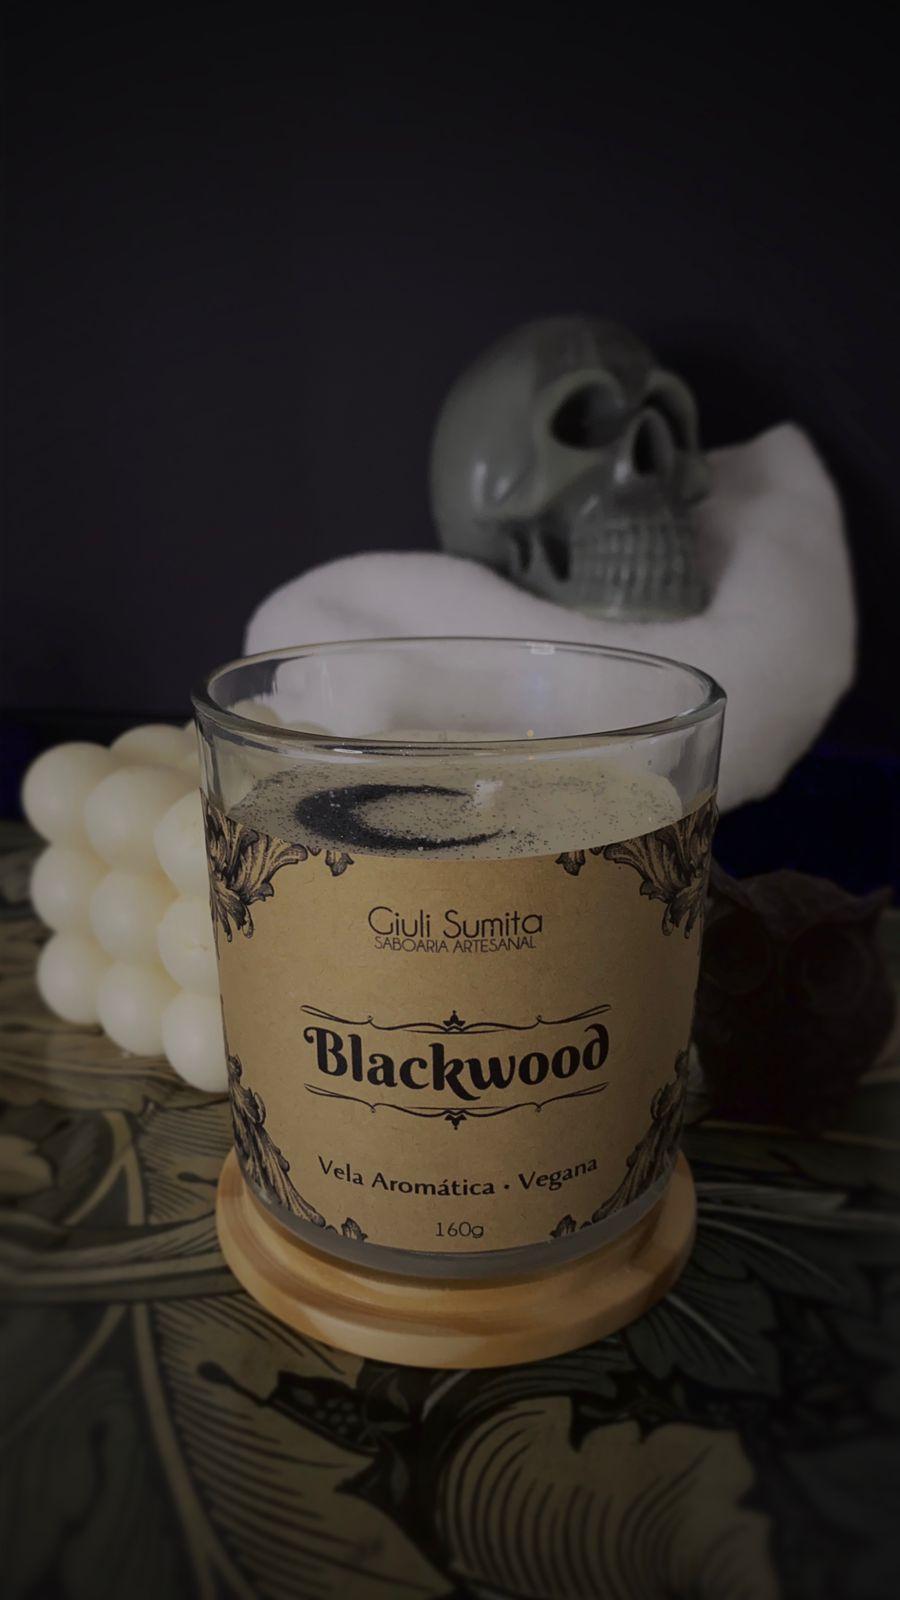 Blackwood - Vela aromática - 160g